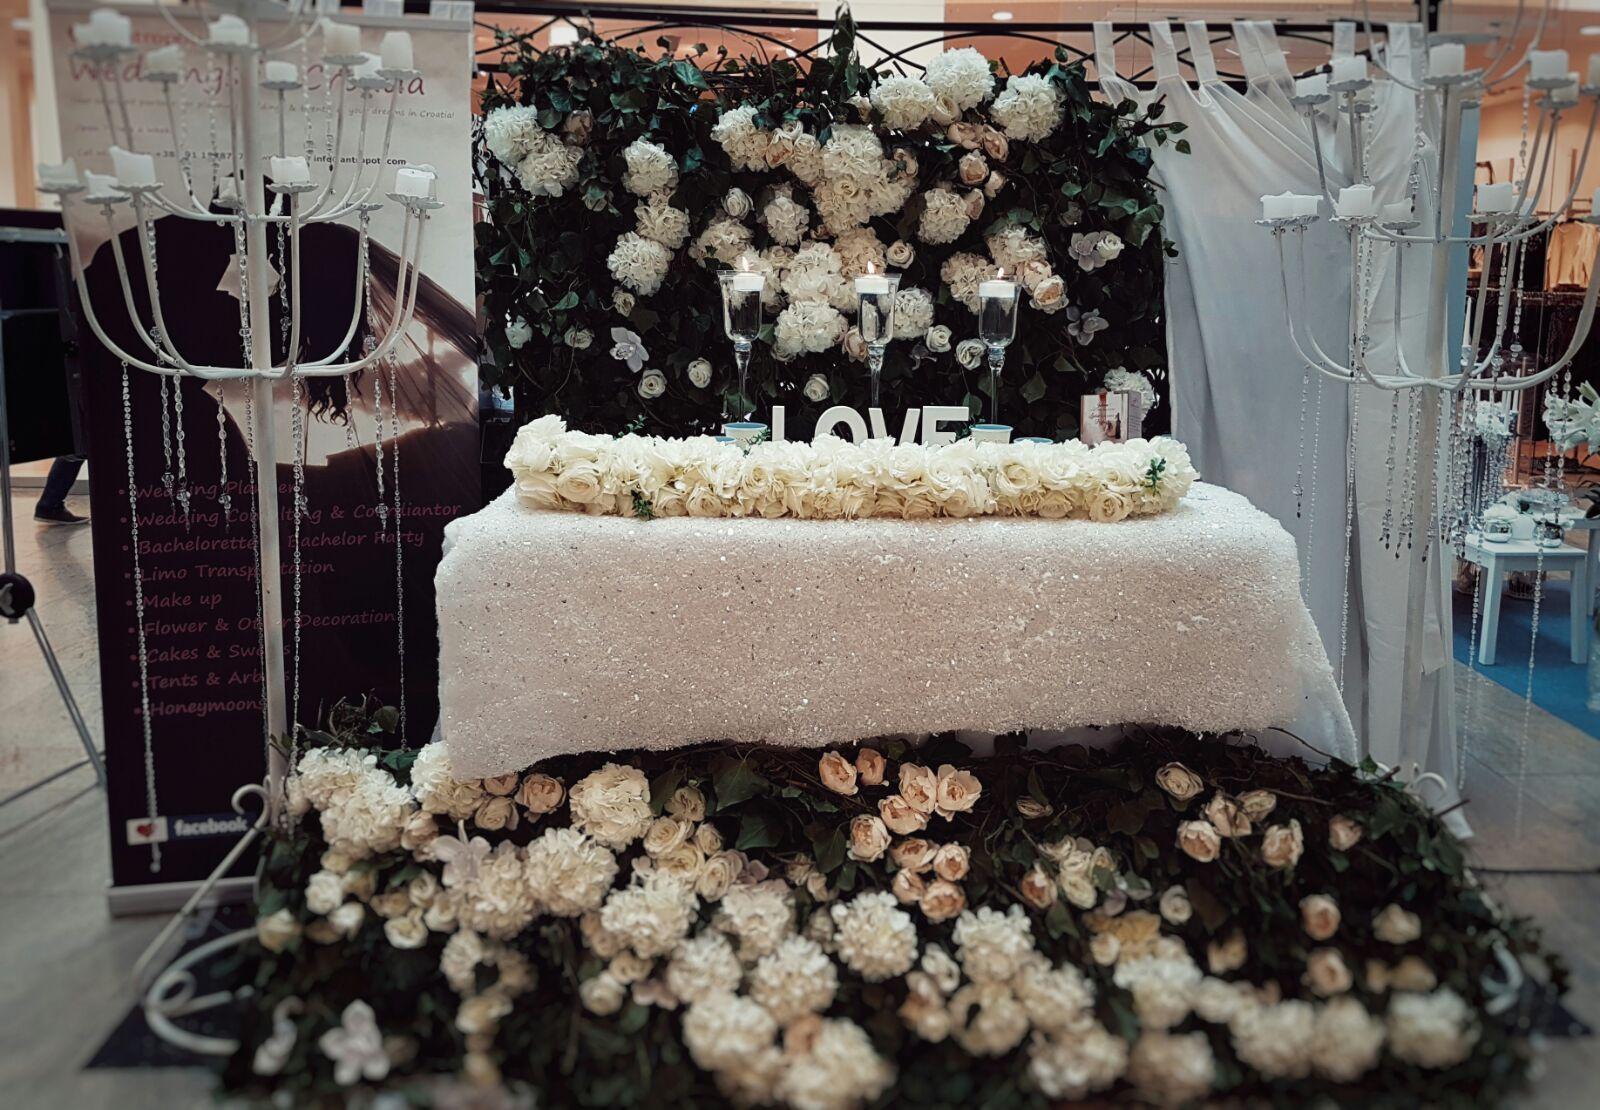 Sajam Vjenčanja u Westgate Shopping Cityju Wedding Expo 2016